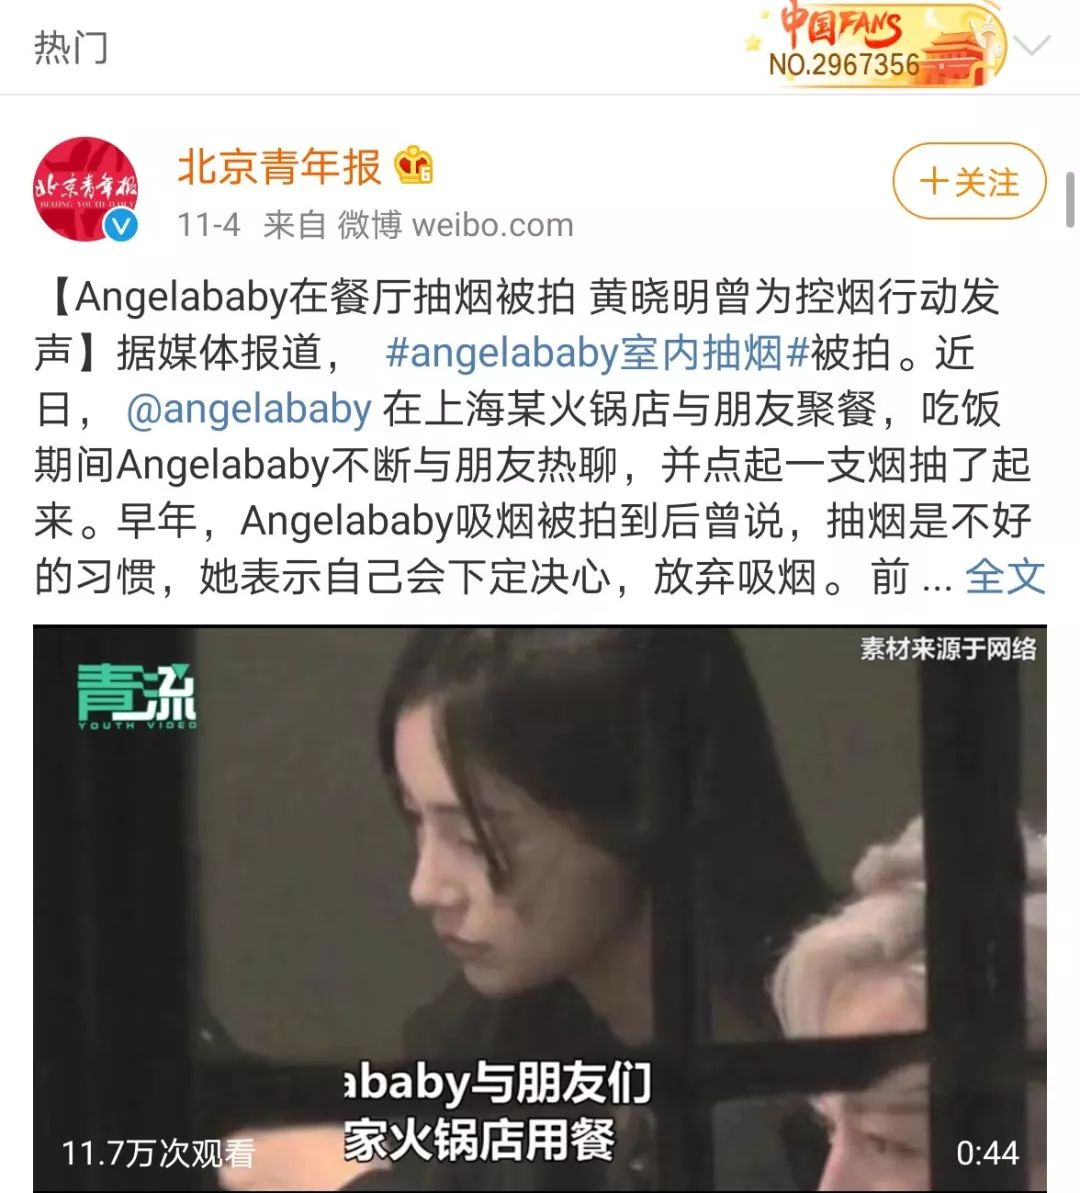 http://www.umeiwen.com/baguajing/1022696.html